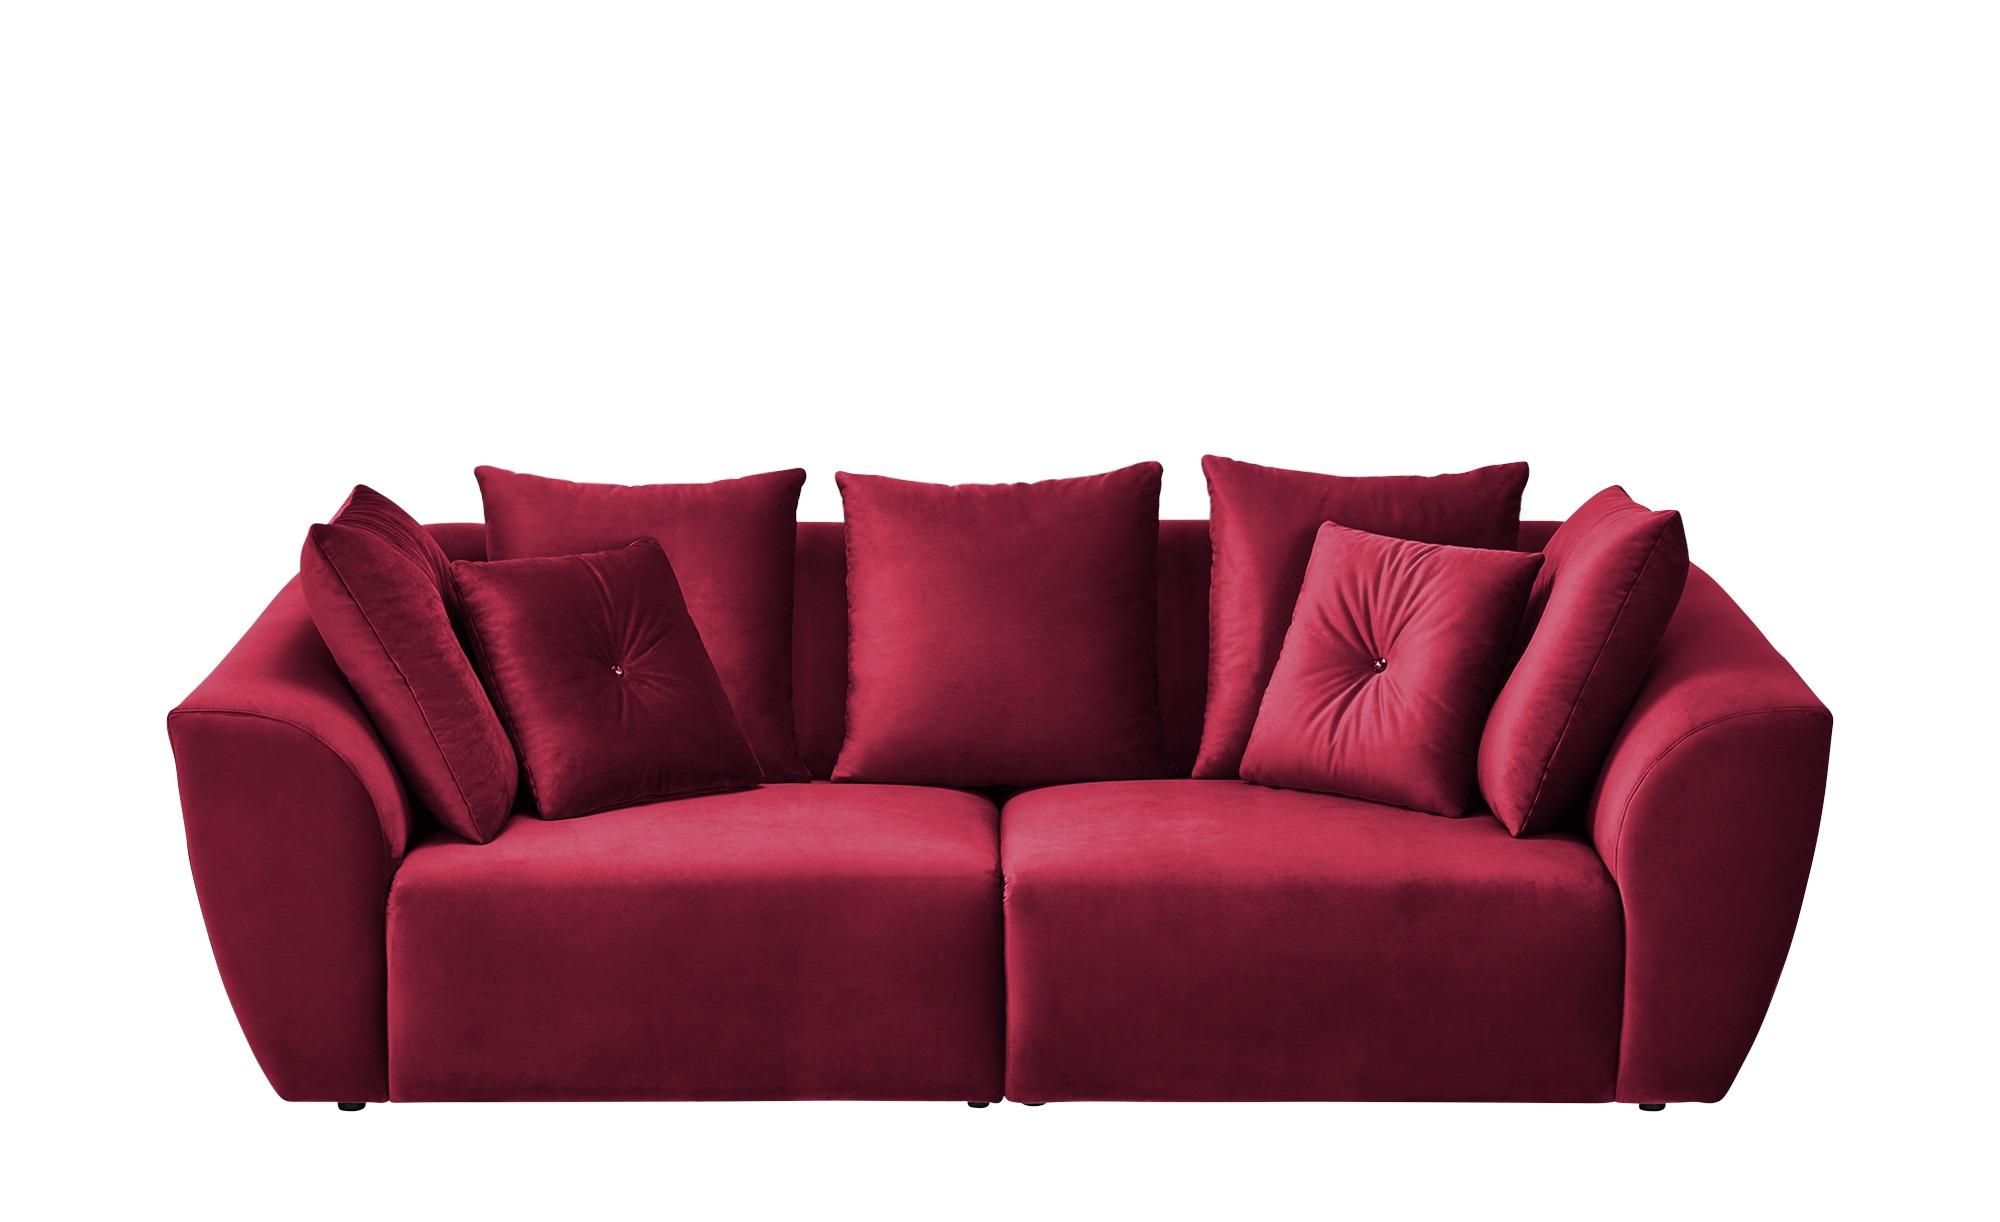 smart Big Sofa  Krista ¦ rot ¦ Maße (cm): B: 254 H: 92 T: 113 Polstermöbel > Sofas > Big-Sofas - Höffner